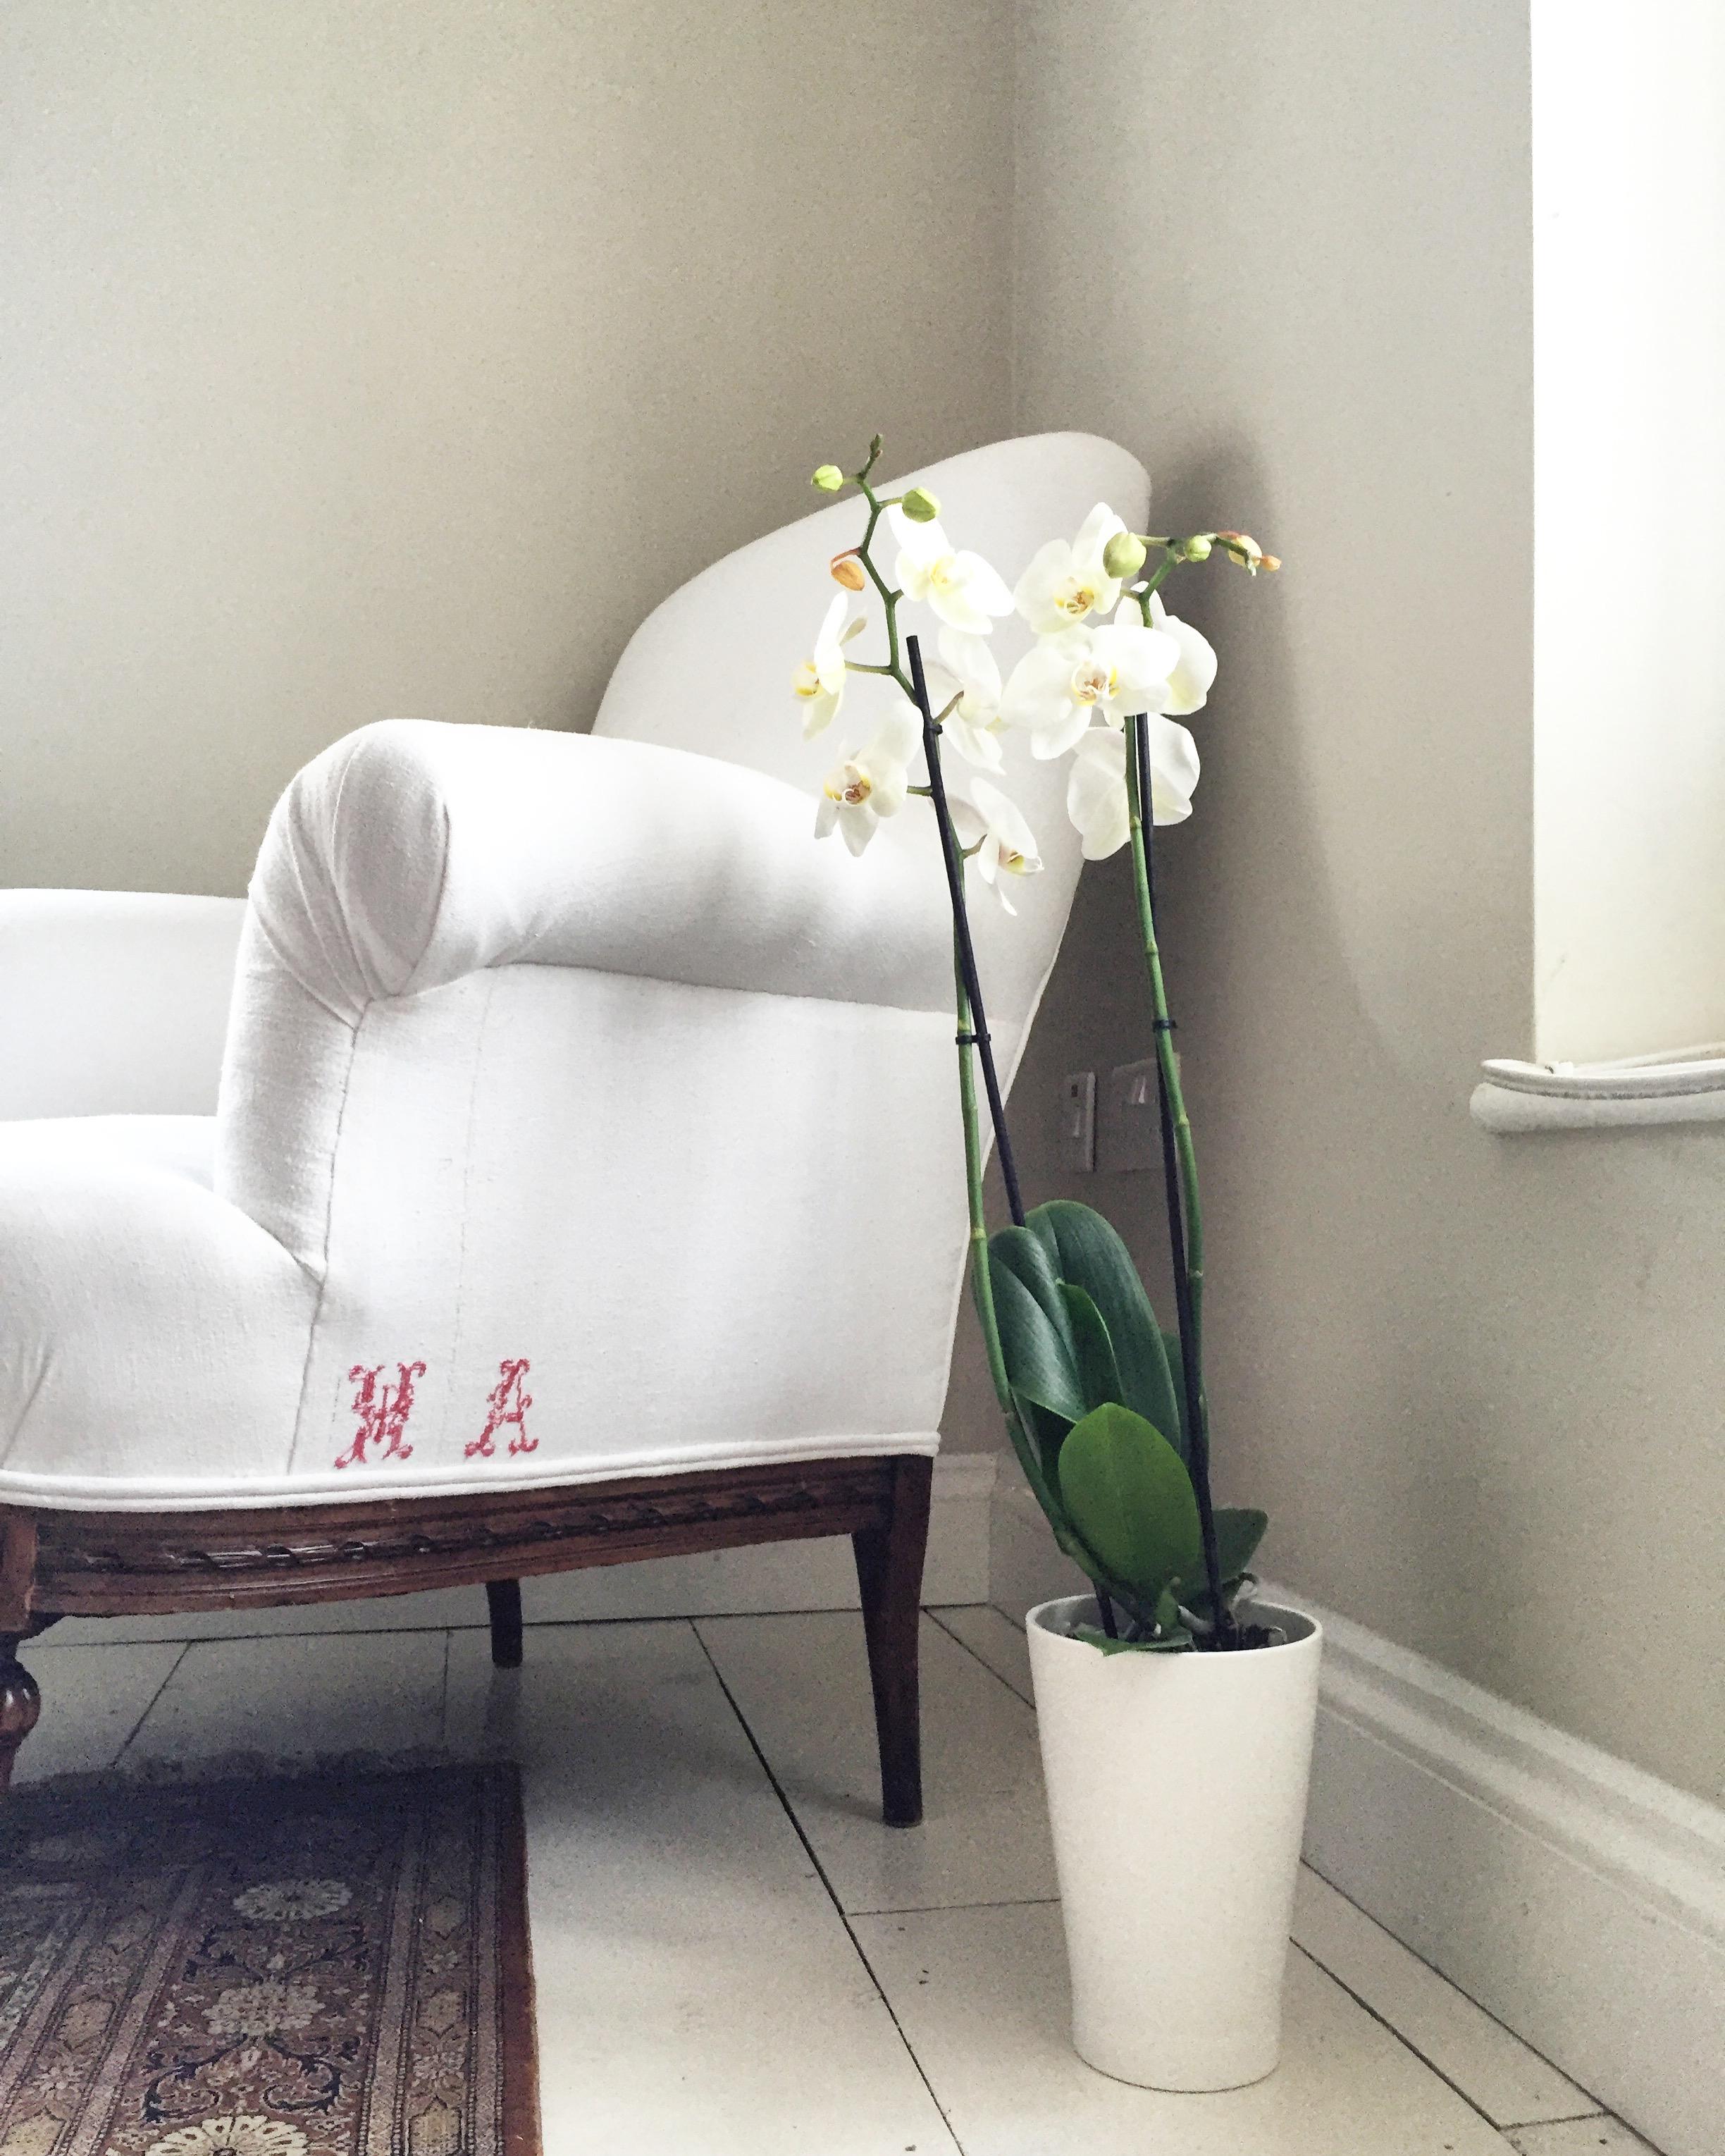 Residential: Bespoke Monogrammed French linen chair.